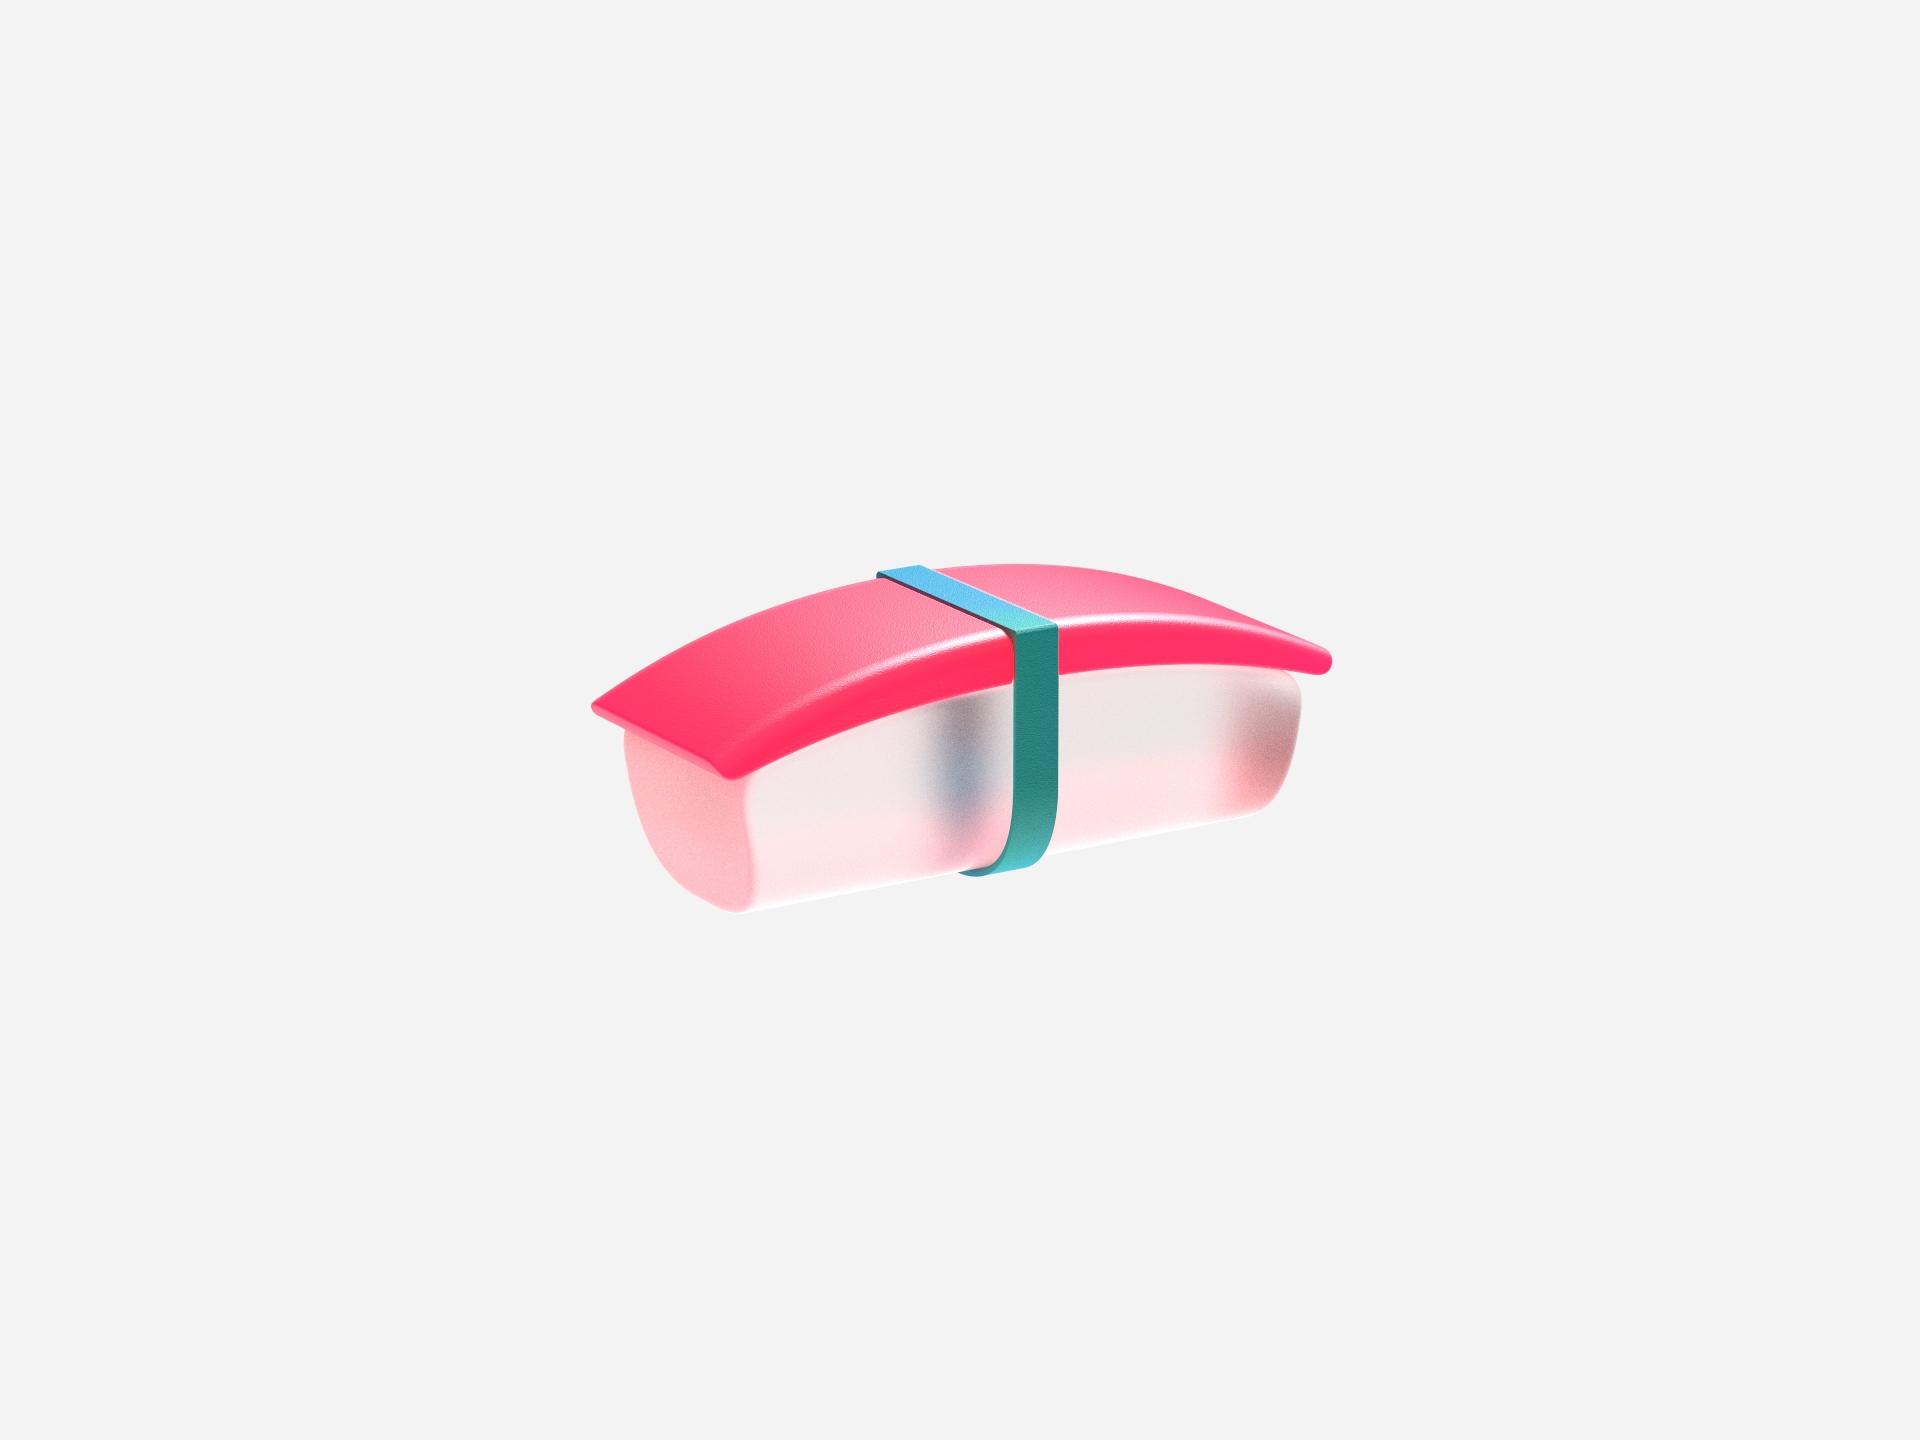 sushi - 3D, render, color, keyshot - chengtaoyi | ello